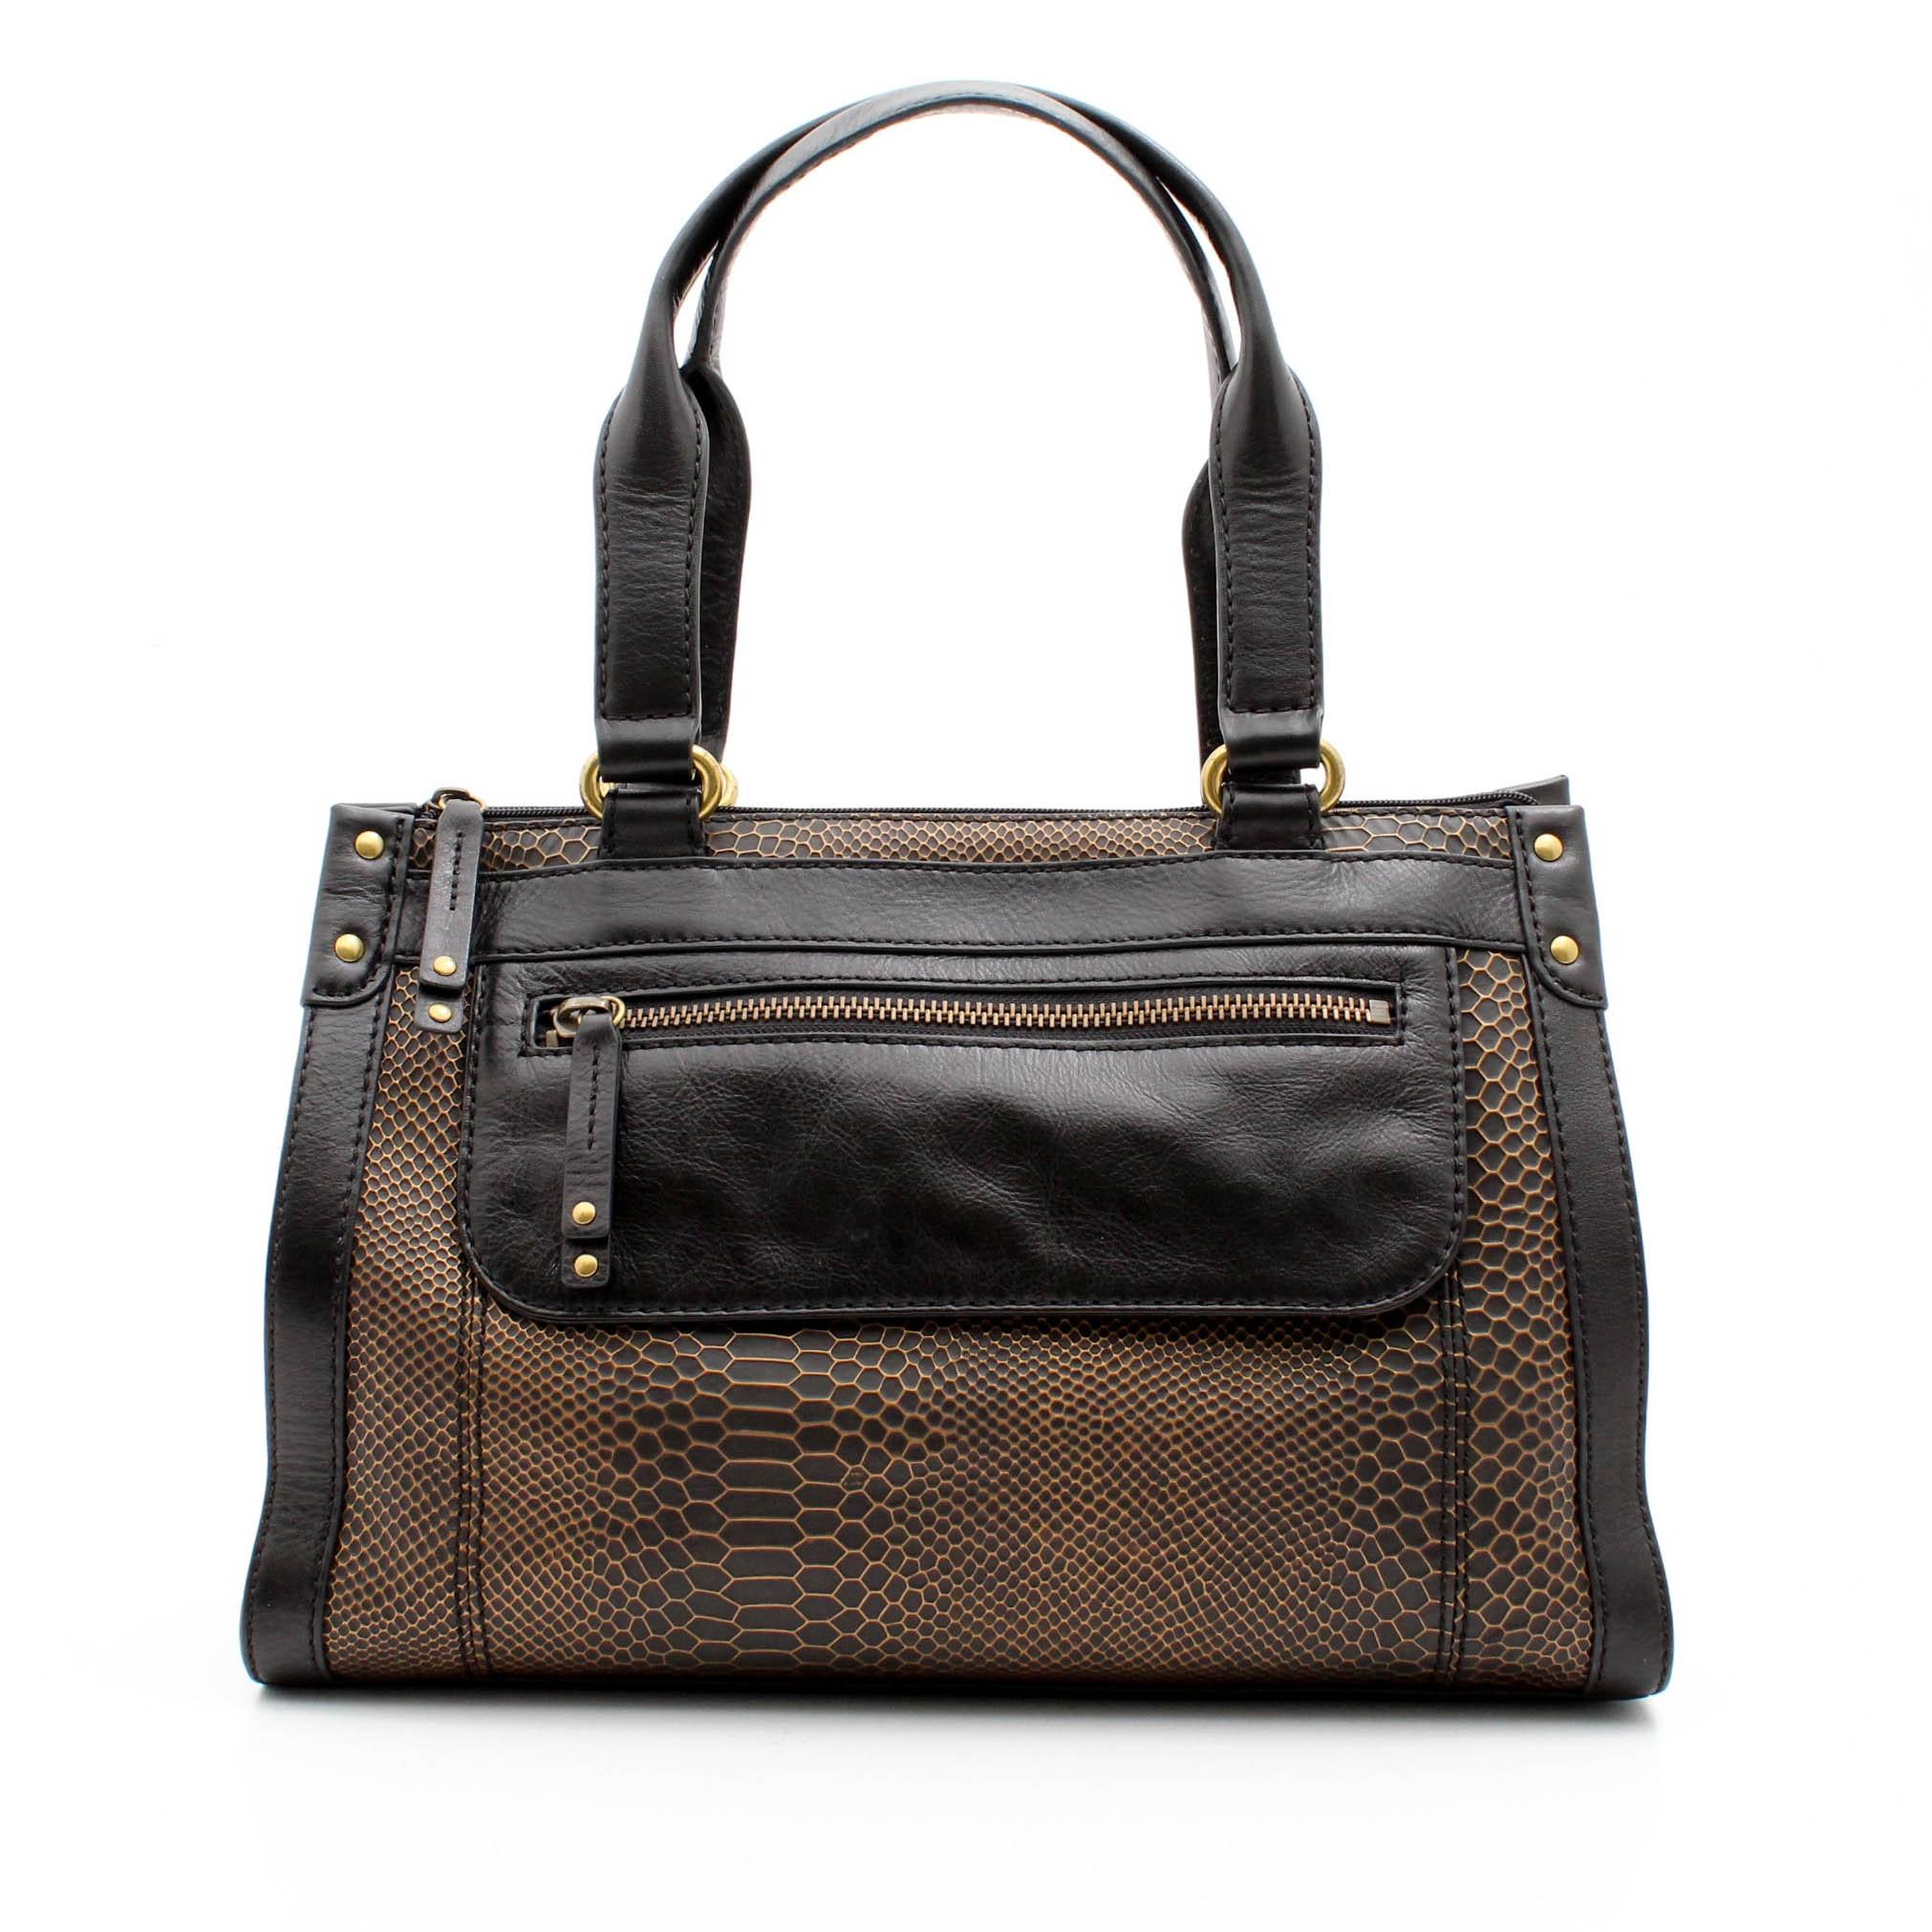 Fossil Gold and Black Snakeskin Print Leather Handbag